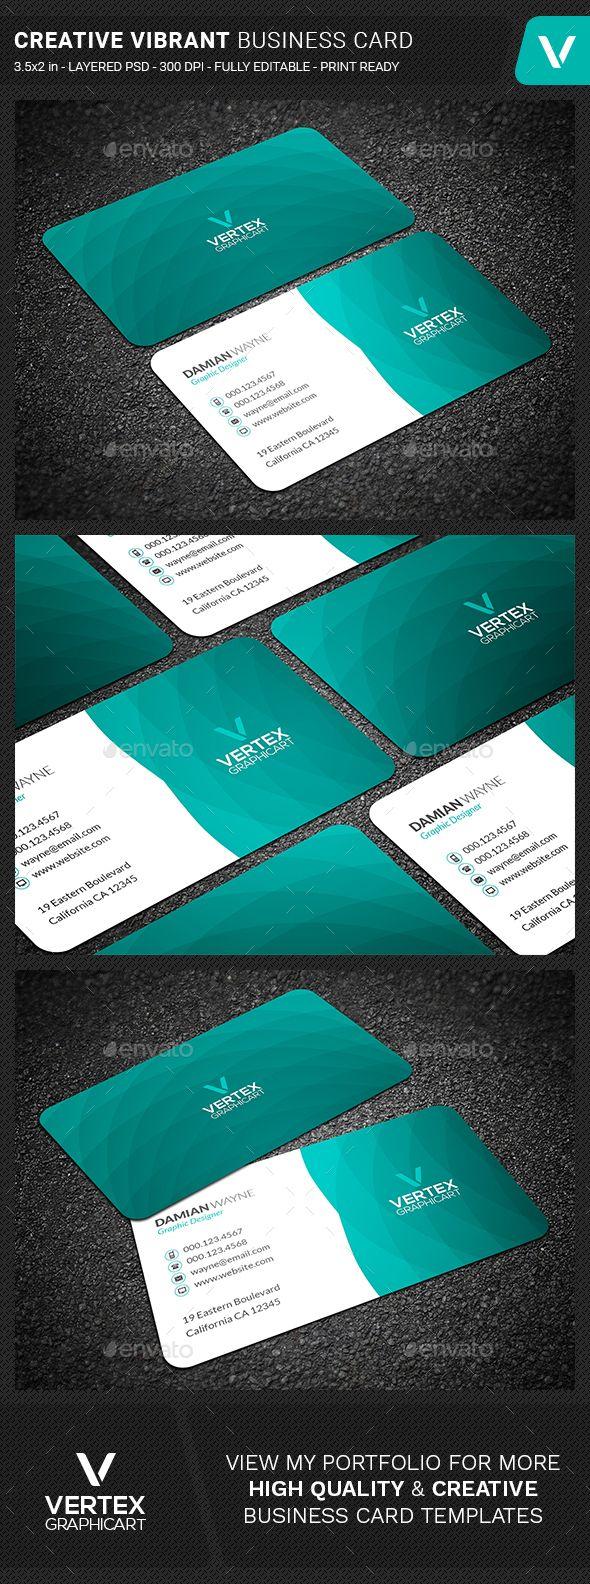 creative vibrant business card template psd